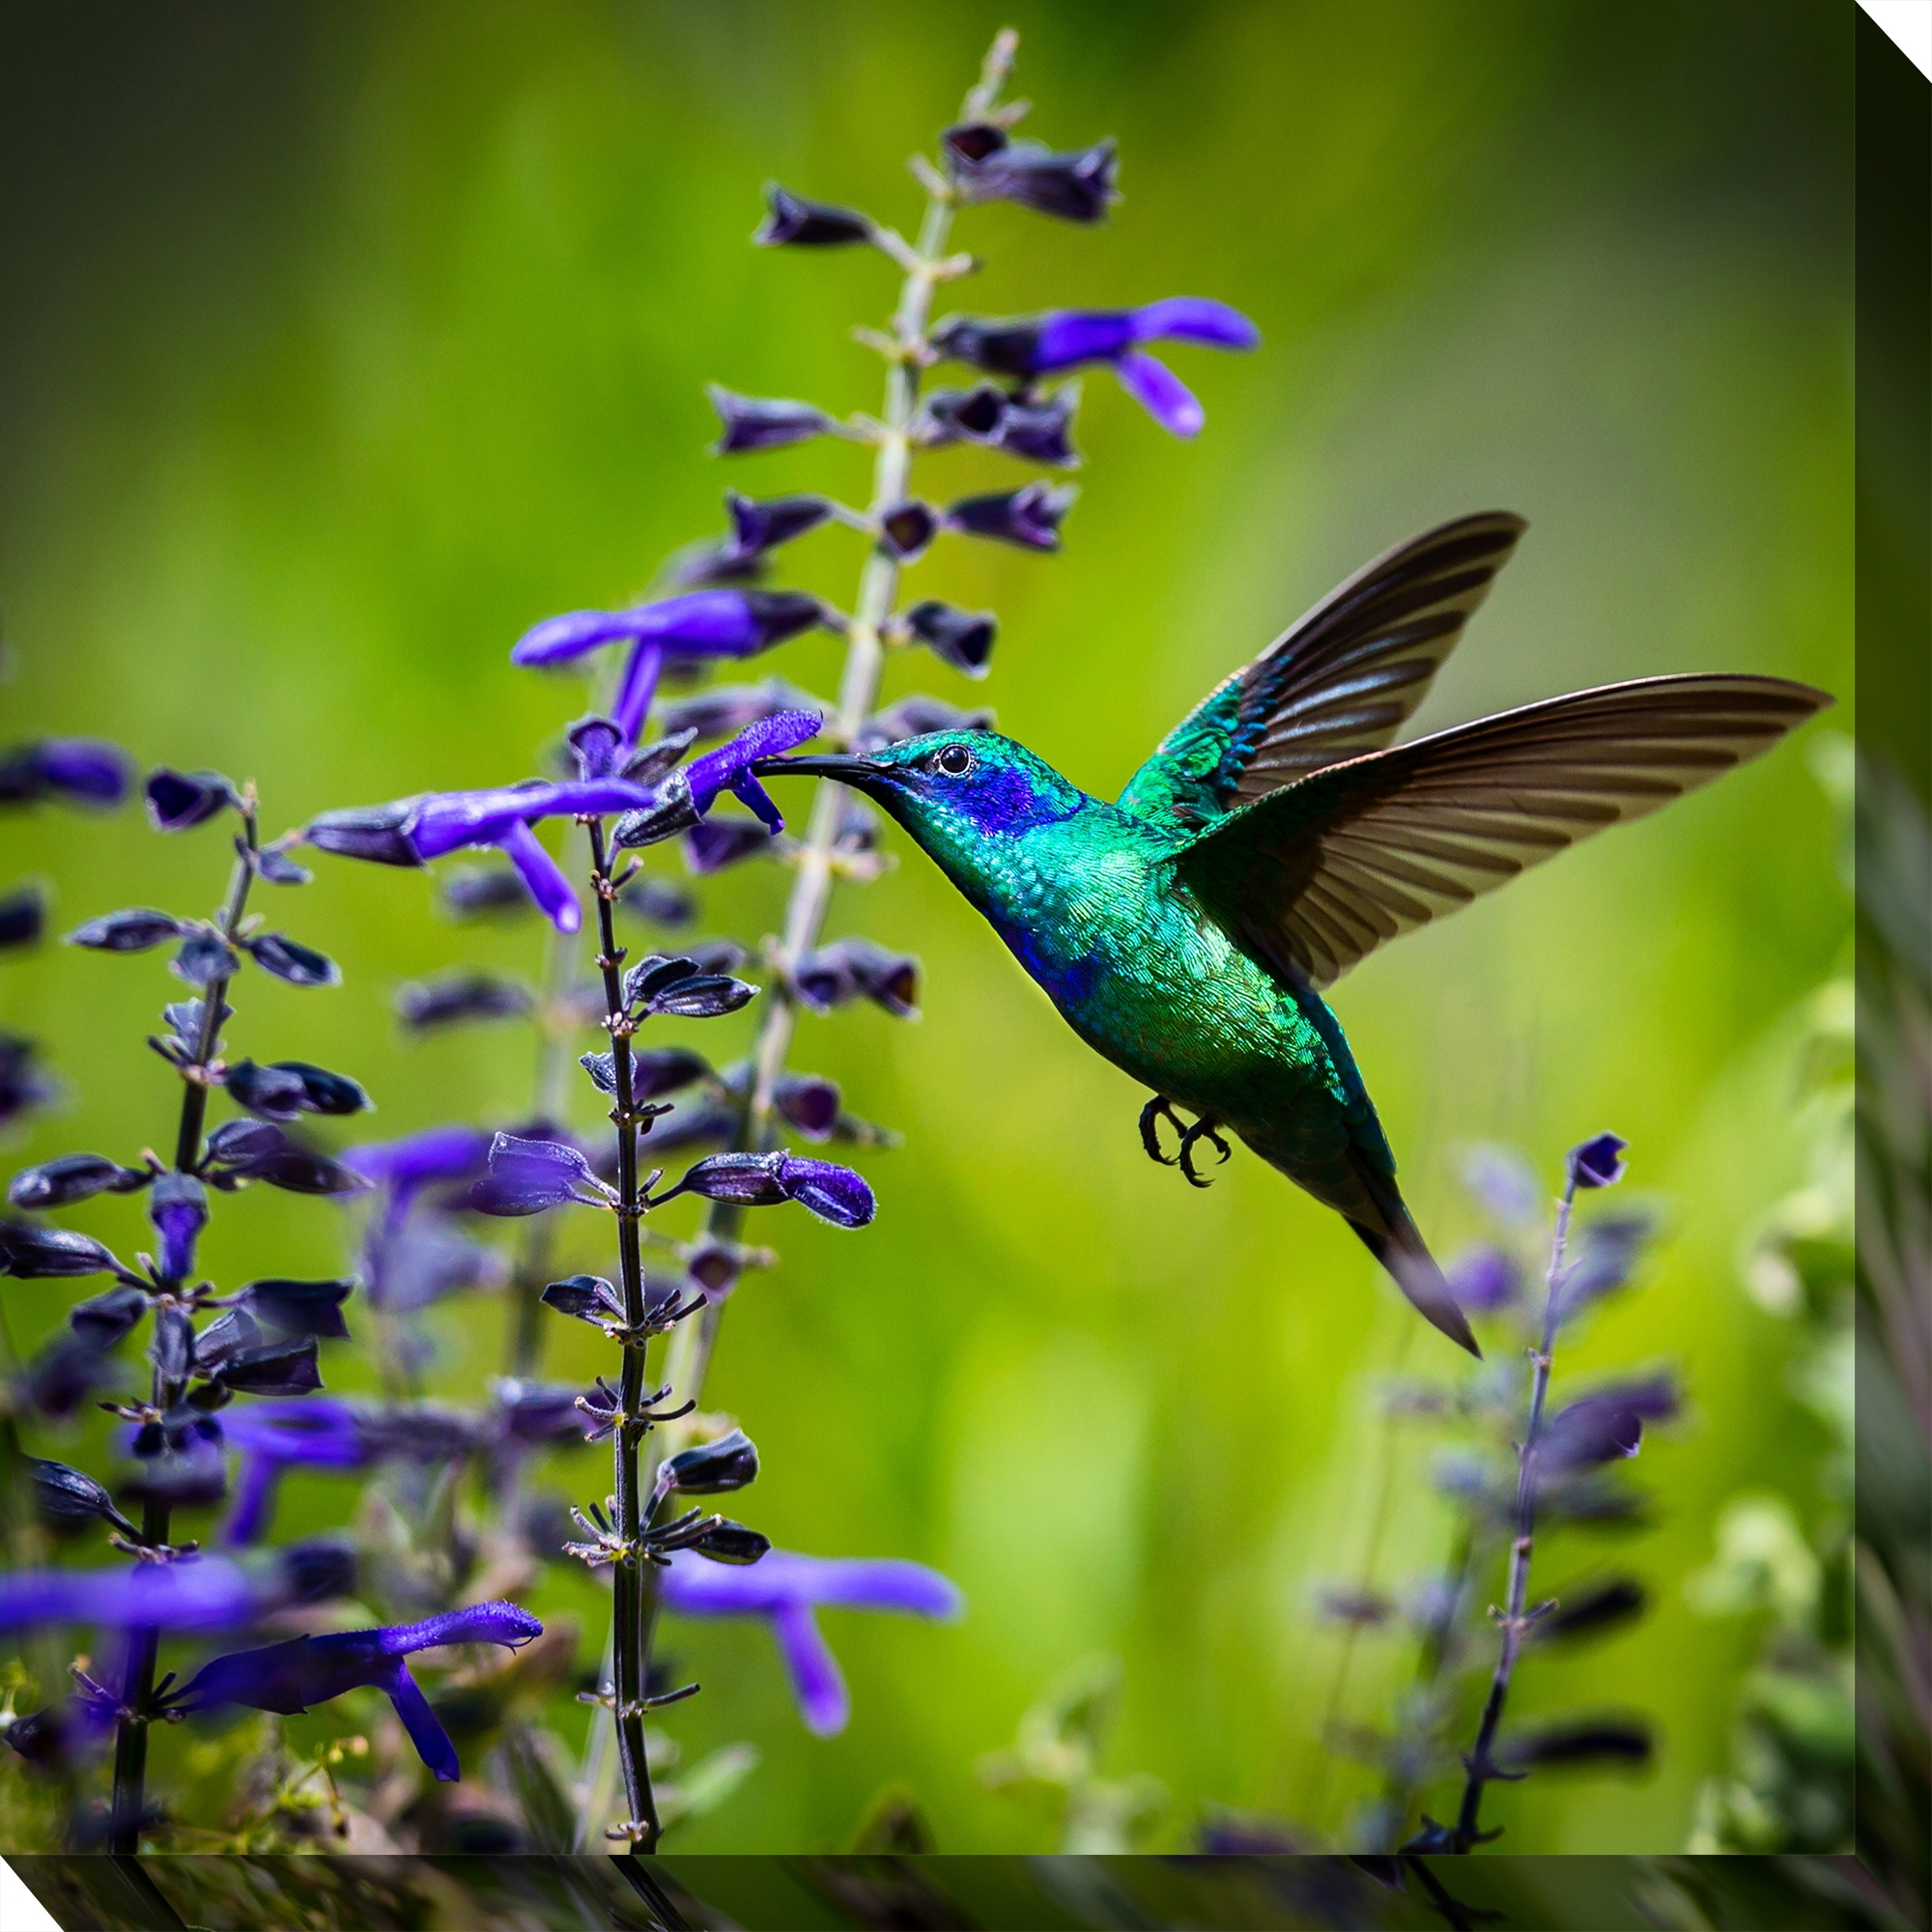 Canvas Wall Art Hummingbird Product Photo